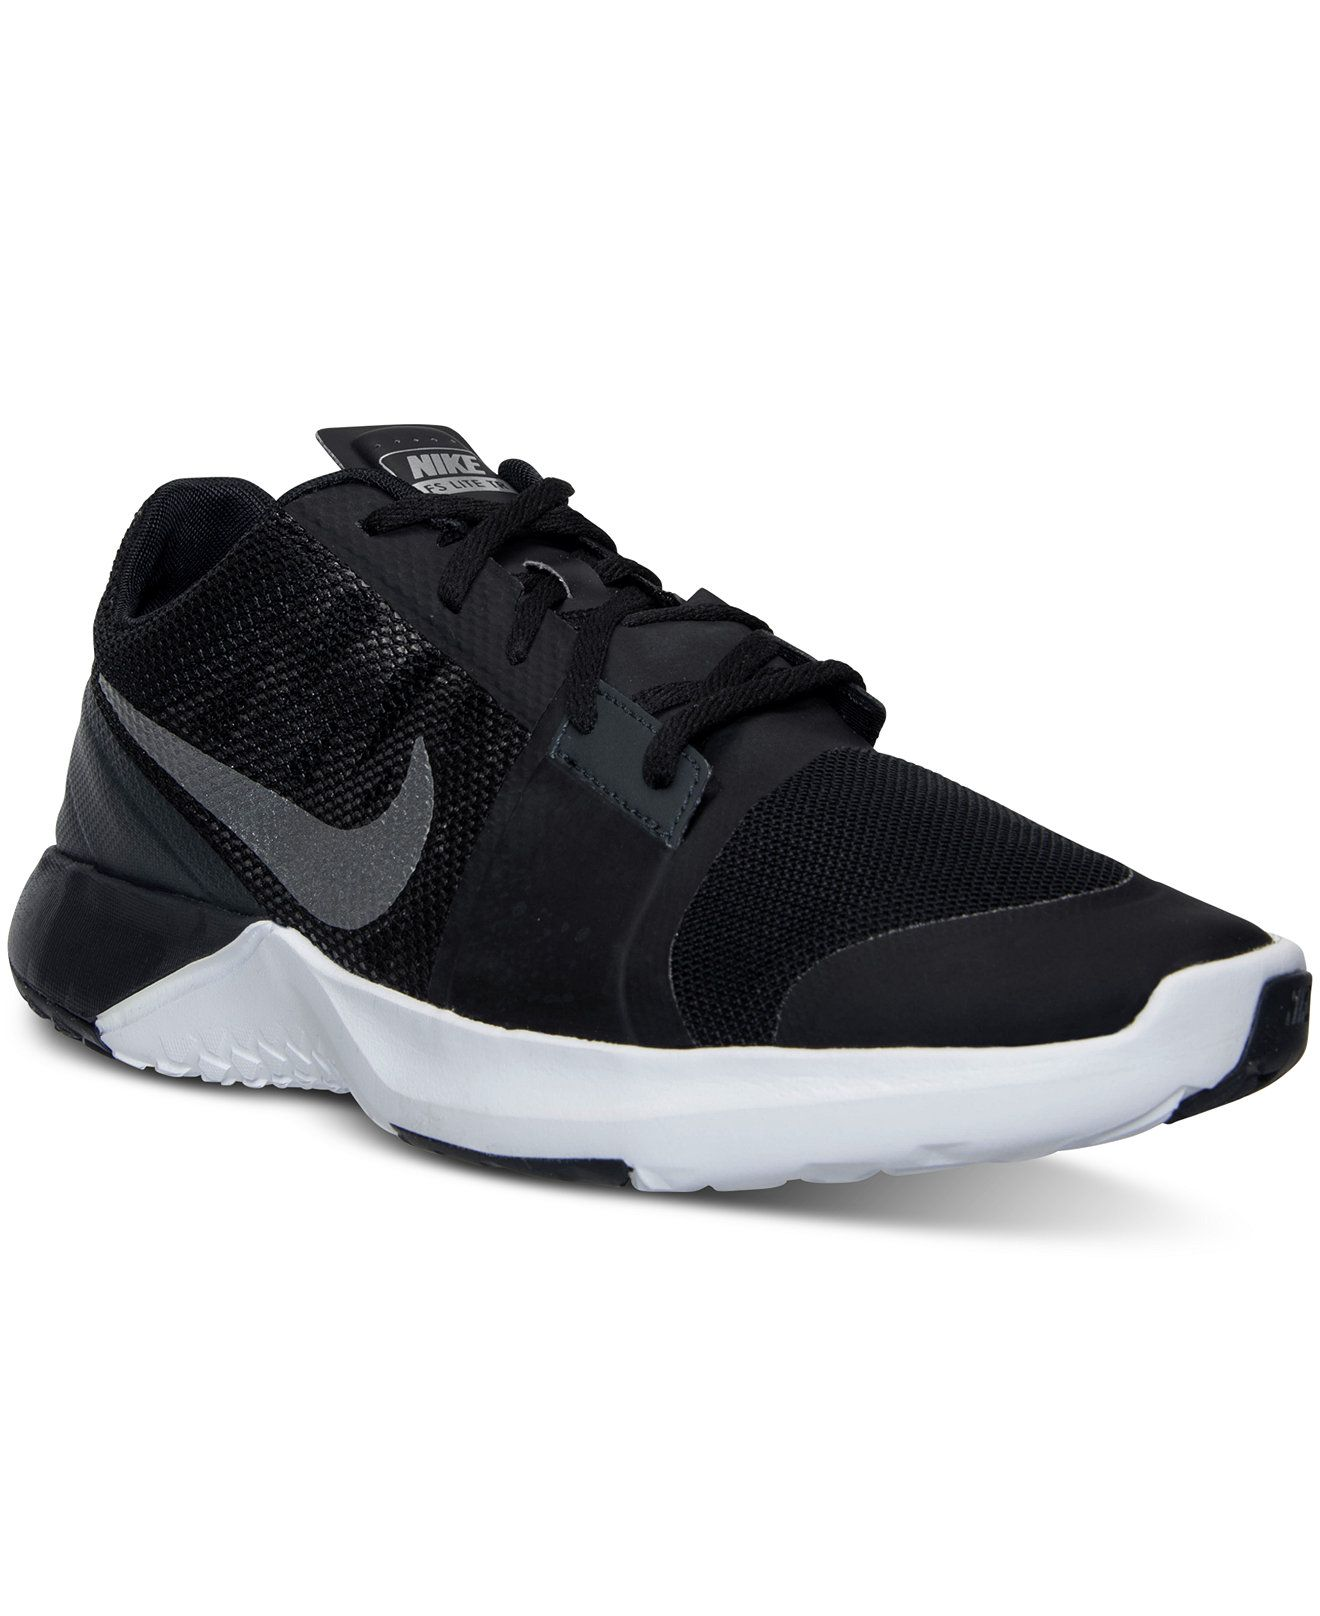 Training sneakers, Nike men